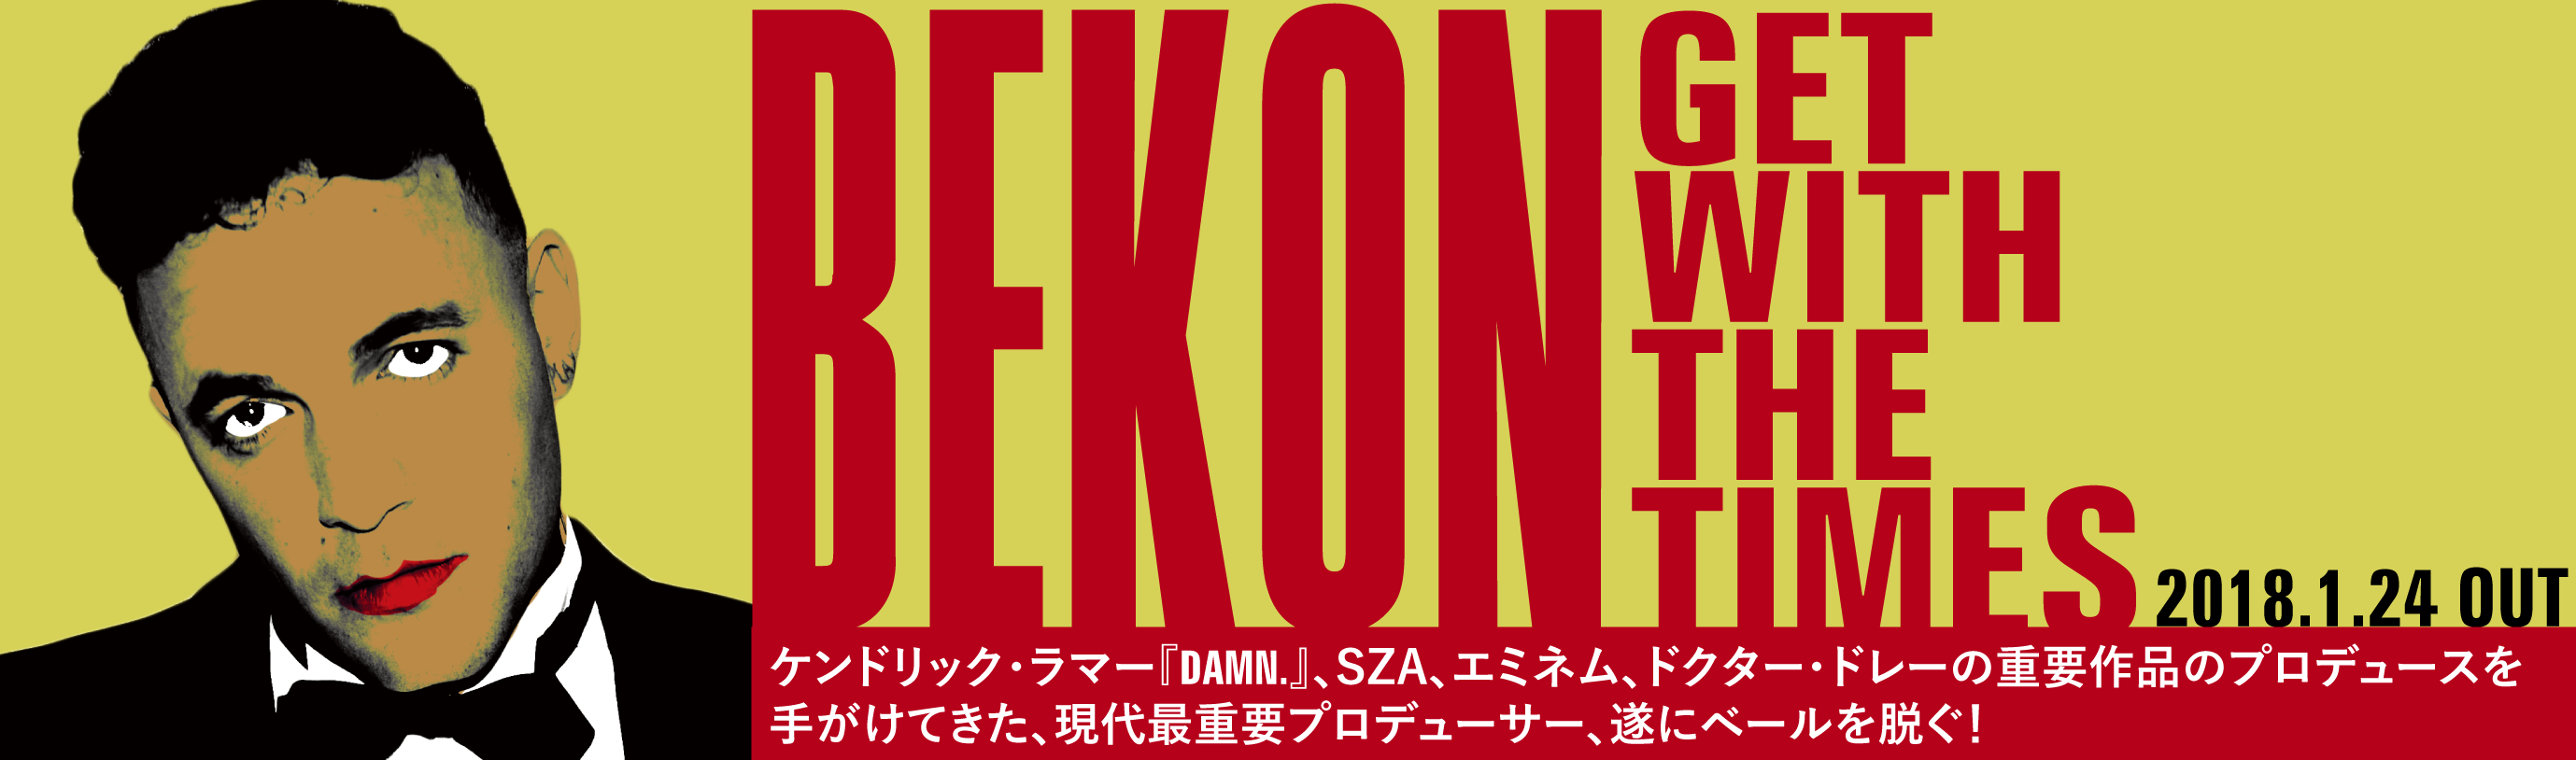 HP-Bekon